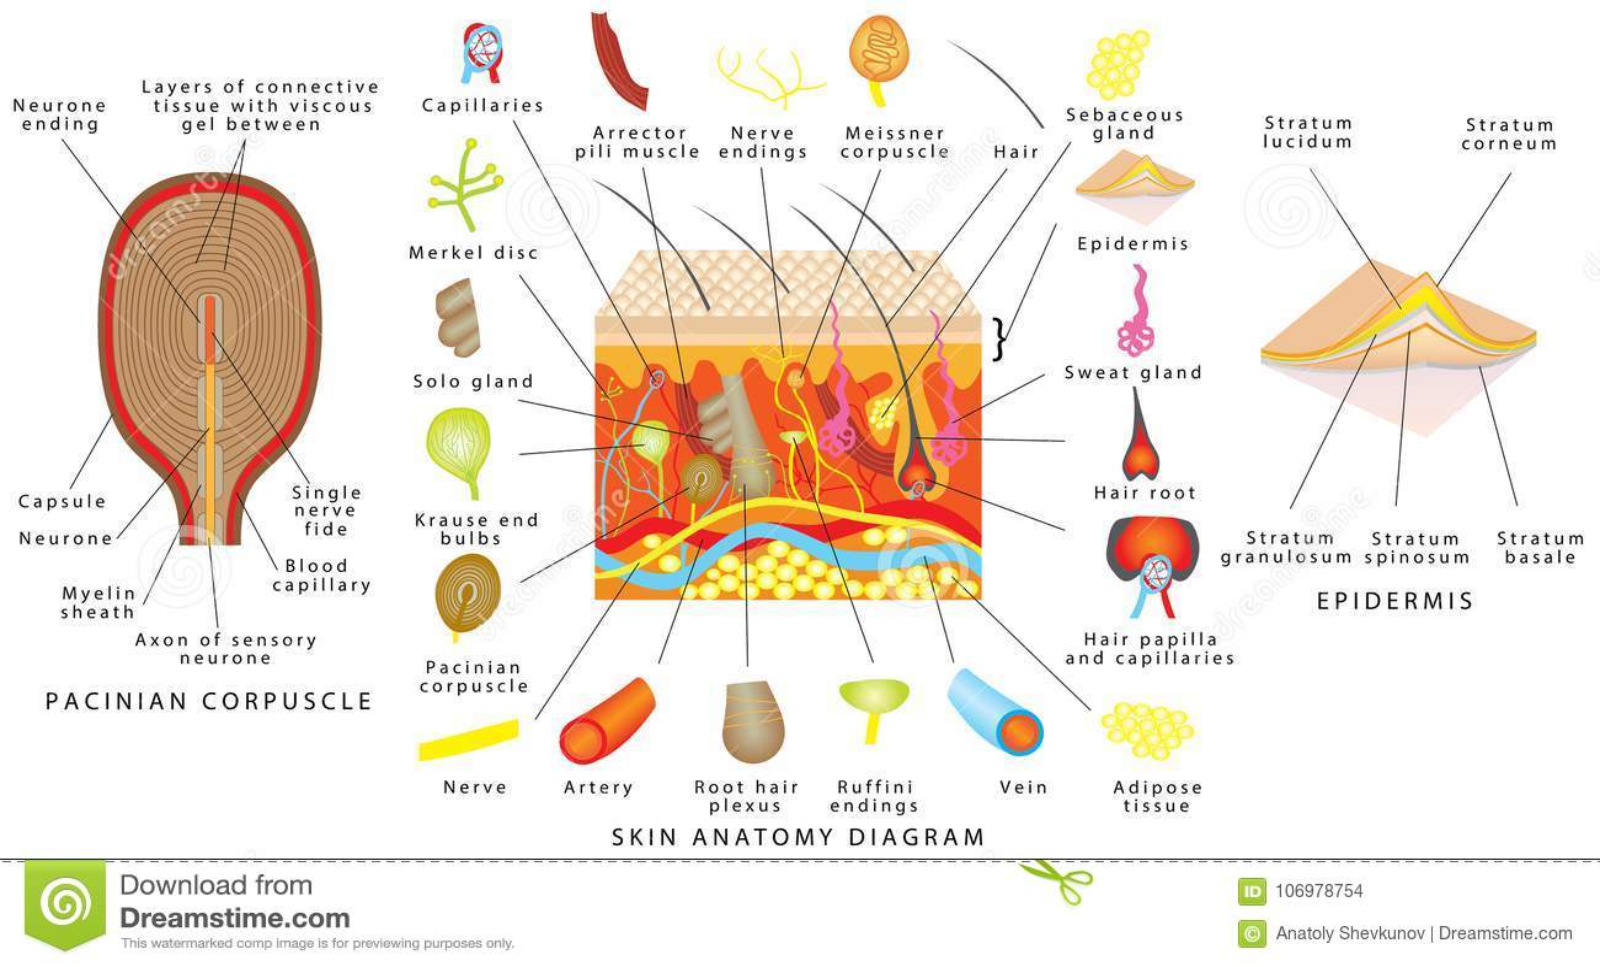 Diagrama da anatomia da pele